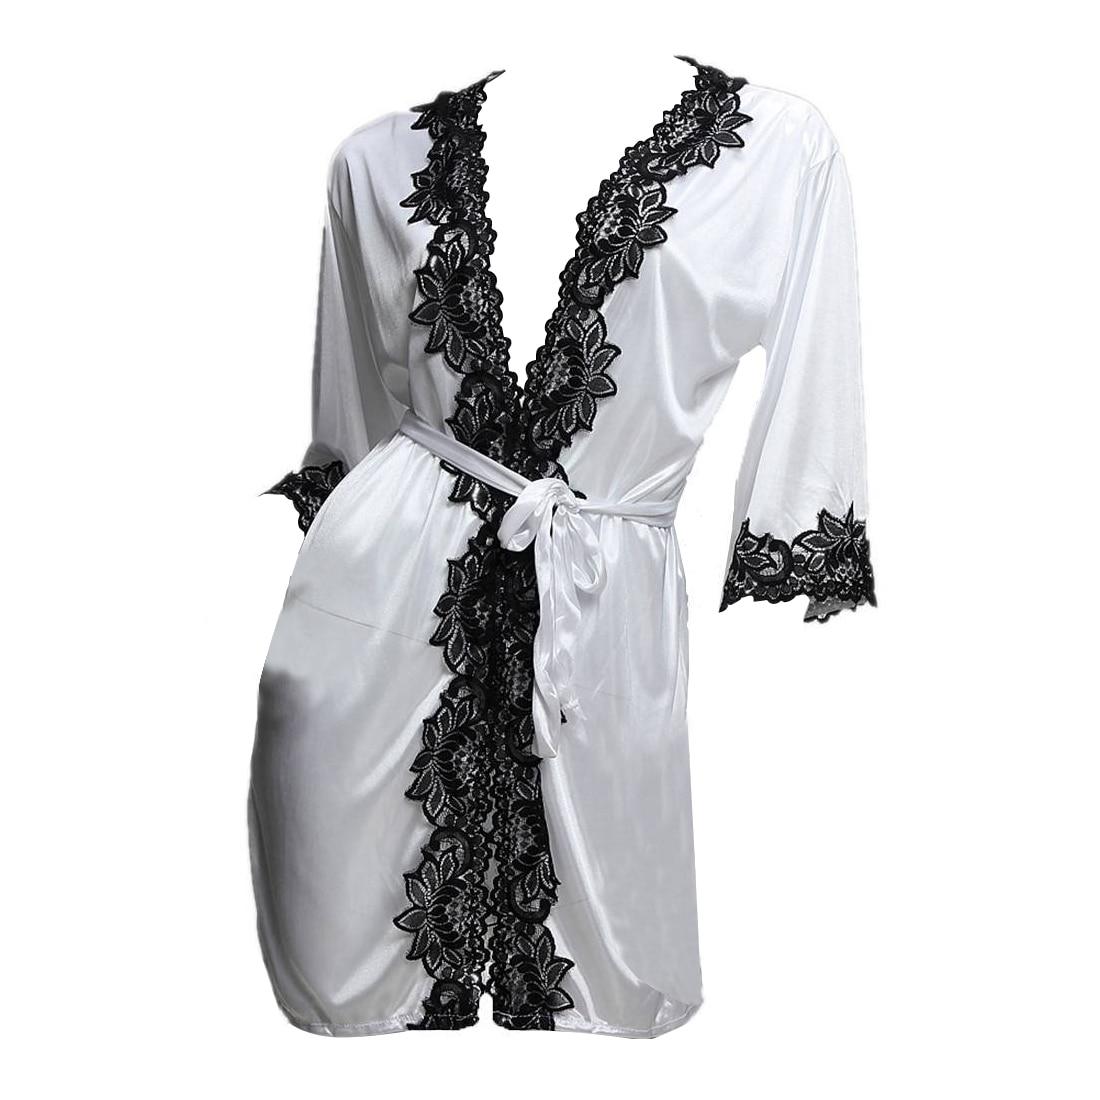 Sexy lace underwear night satin with string morning coat sleepwear Women Nightgowns Cotton Casual Home Nightwear